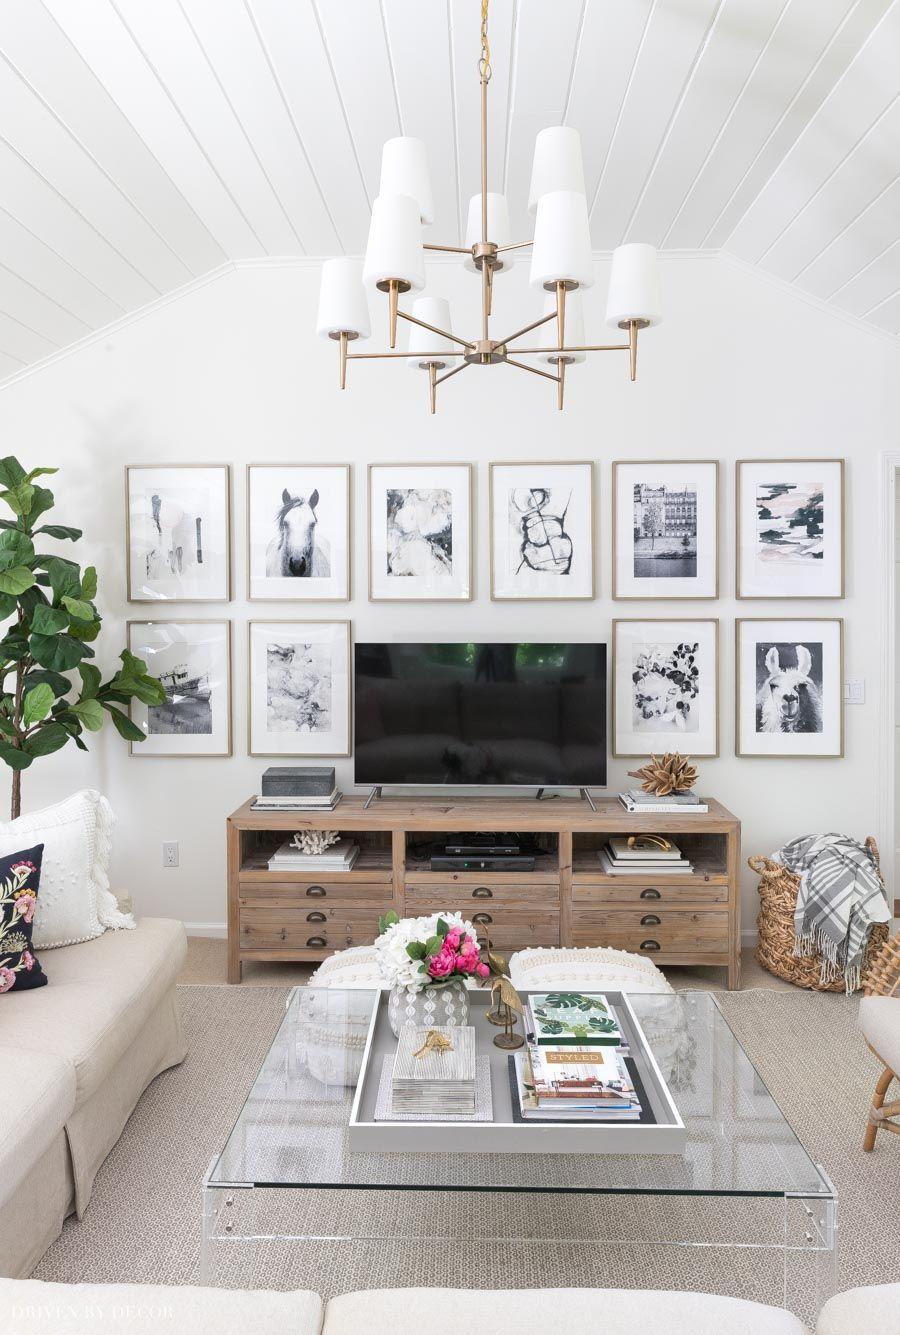 6 Living Room Wall Decor Ideas Say Goodbye To Those Bare Walls Driven By Decor Wall Decor Living Room Family Room Walls Living Room Wall